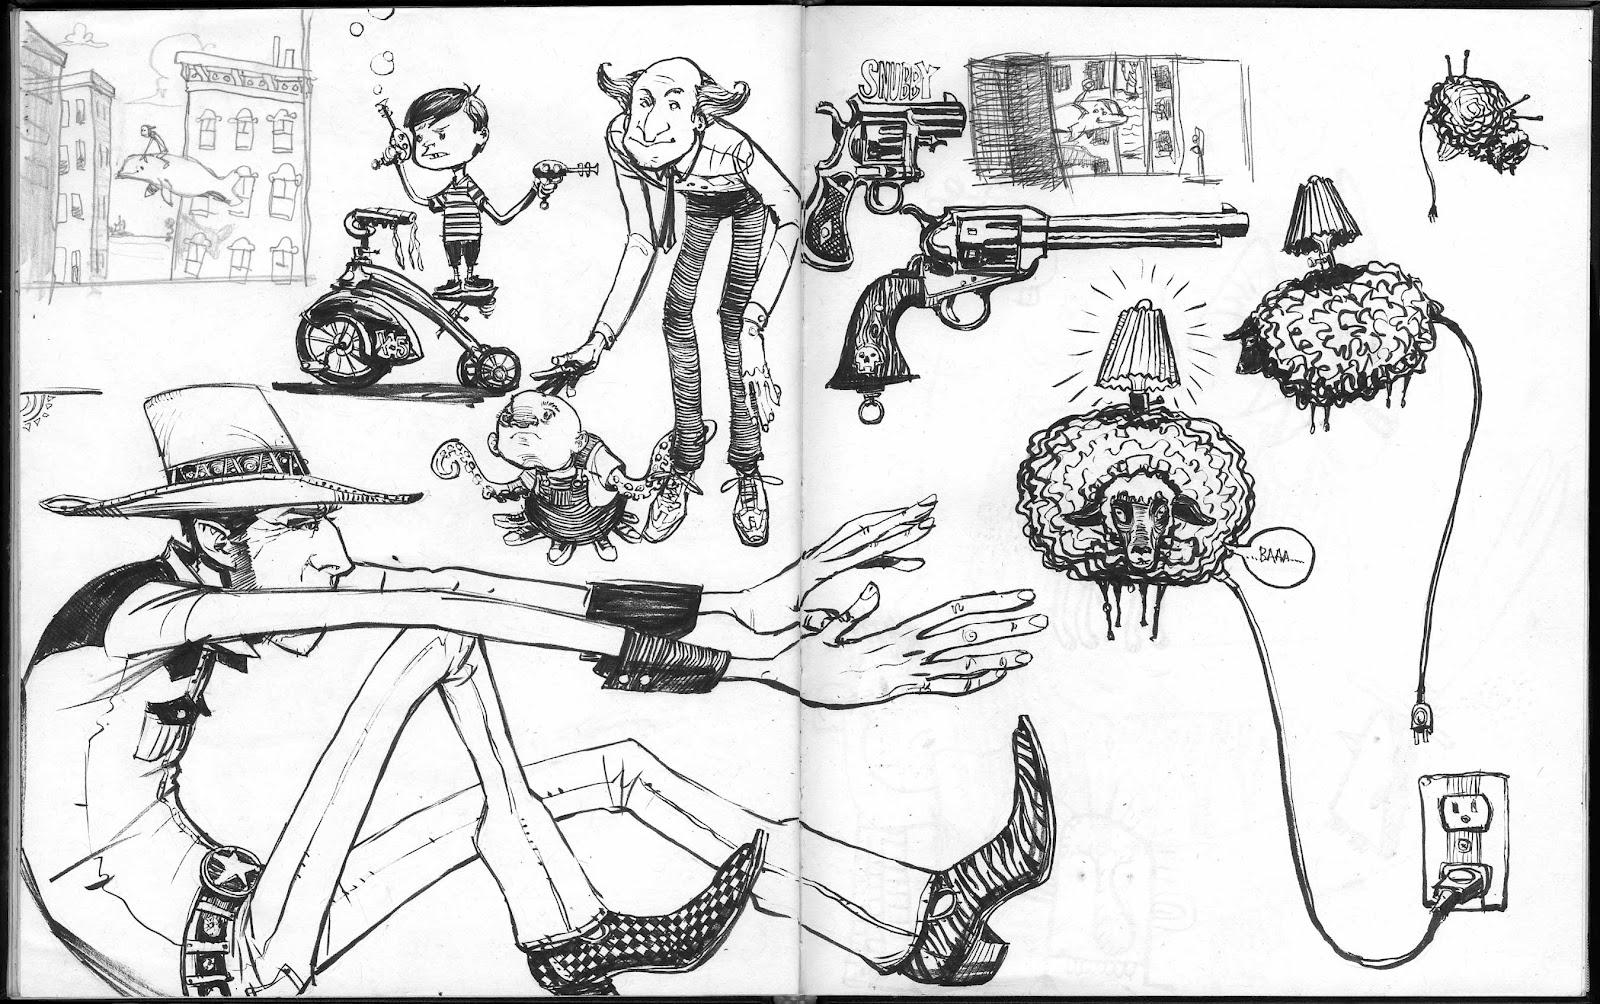 Scott M. Fischer coloring #3, Download drawings